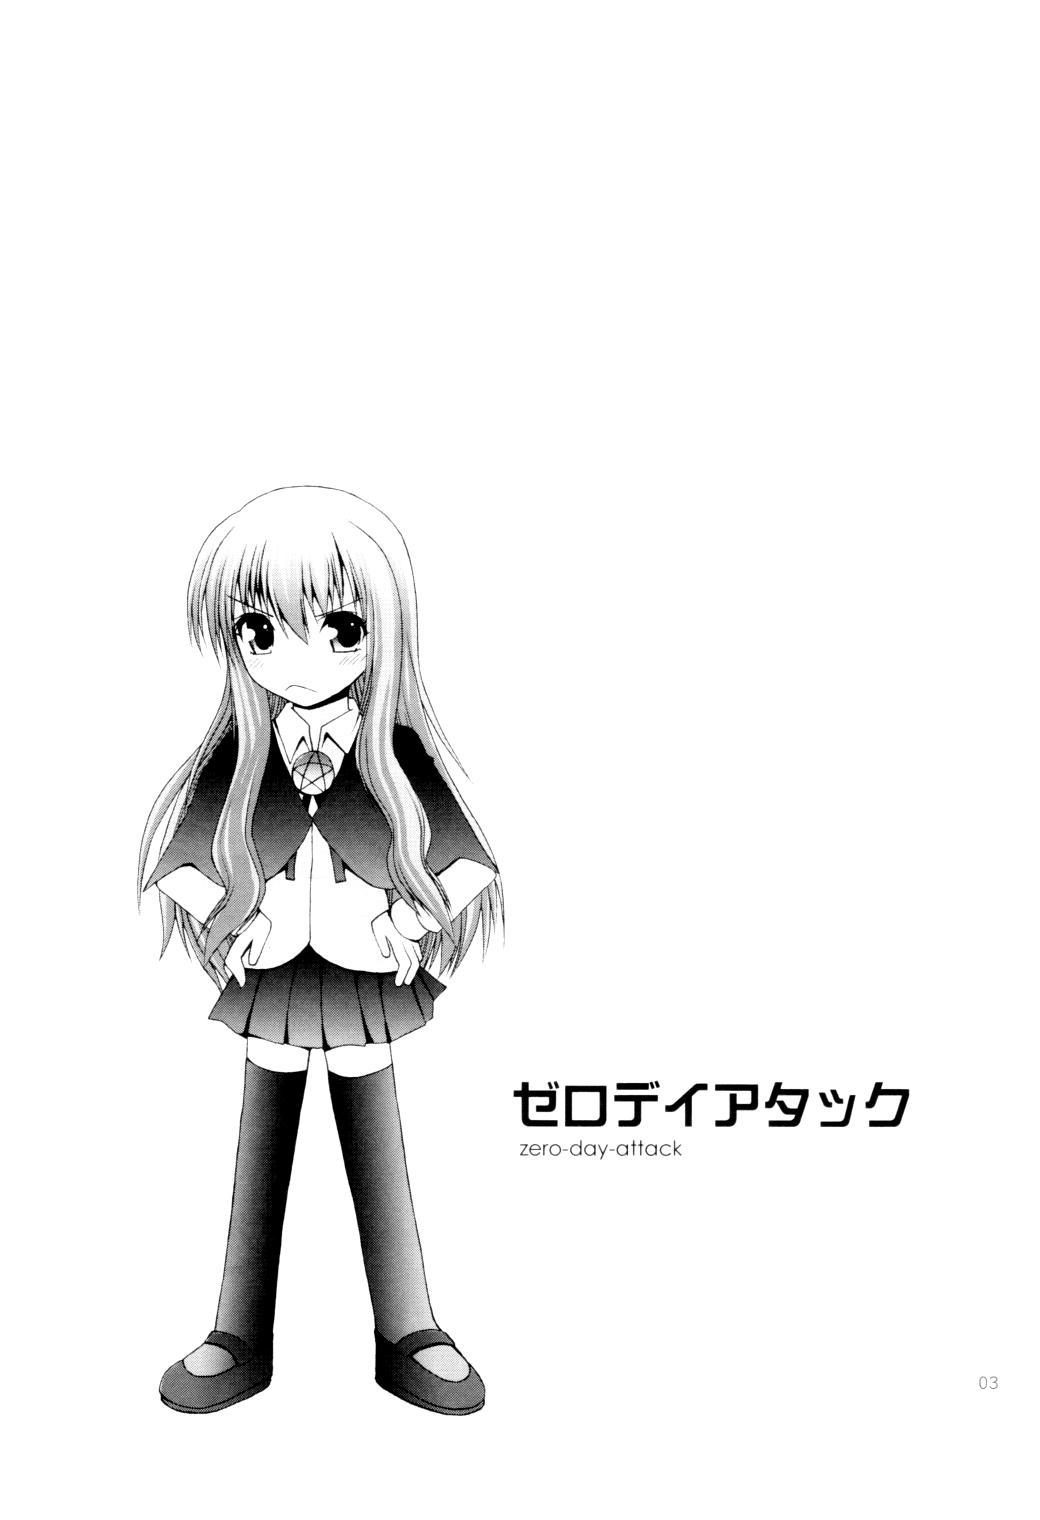 (SC36) [Pico Pico Labyrinth (Fujisaka Lyric)] zero-day-attack (Zero no Tsukaima) [English] [ZEROxLANCELOT] 1